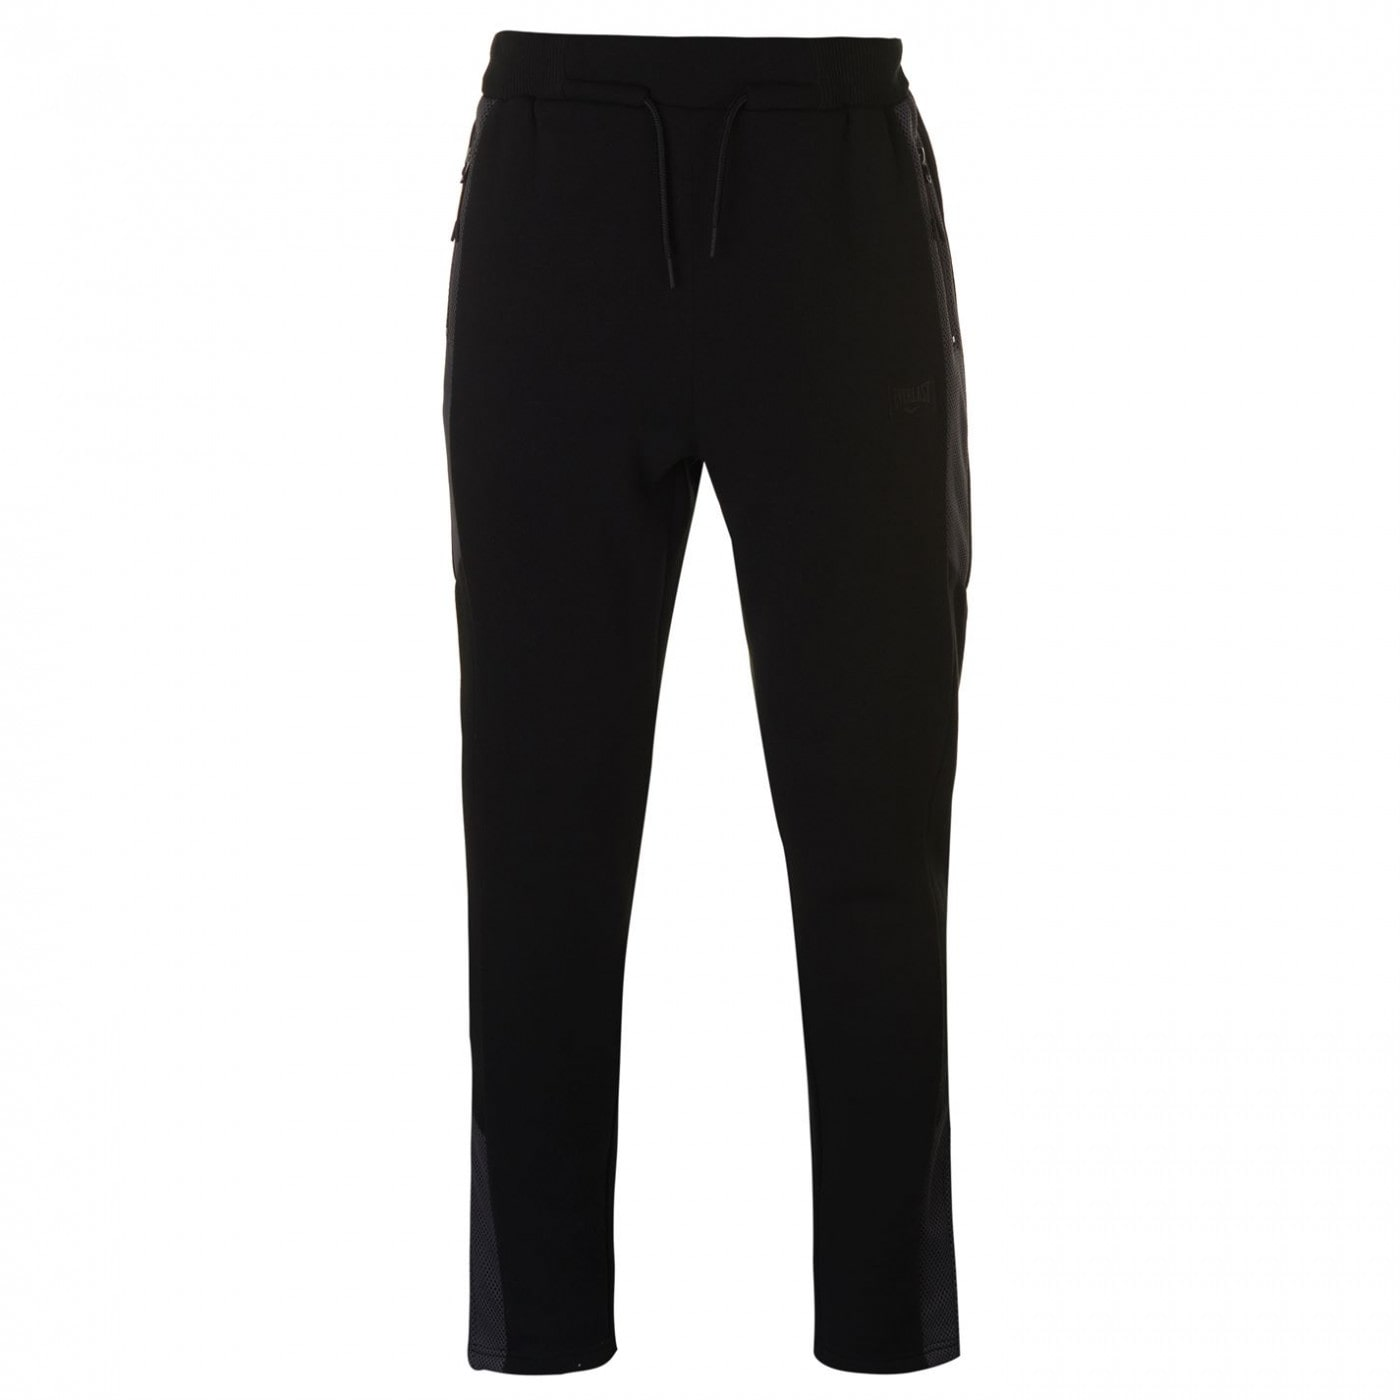 Everlast Premium Open Hem Pants Mens